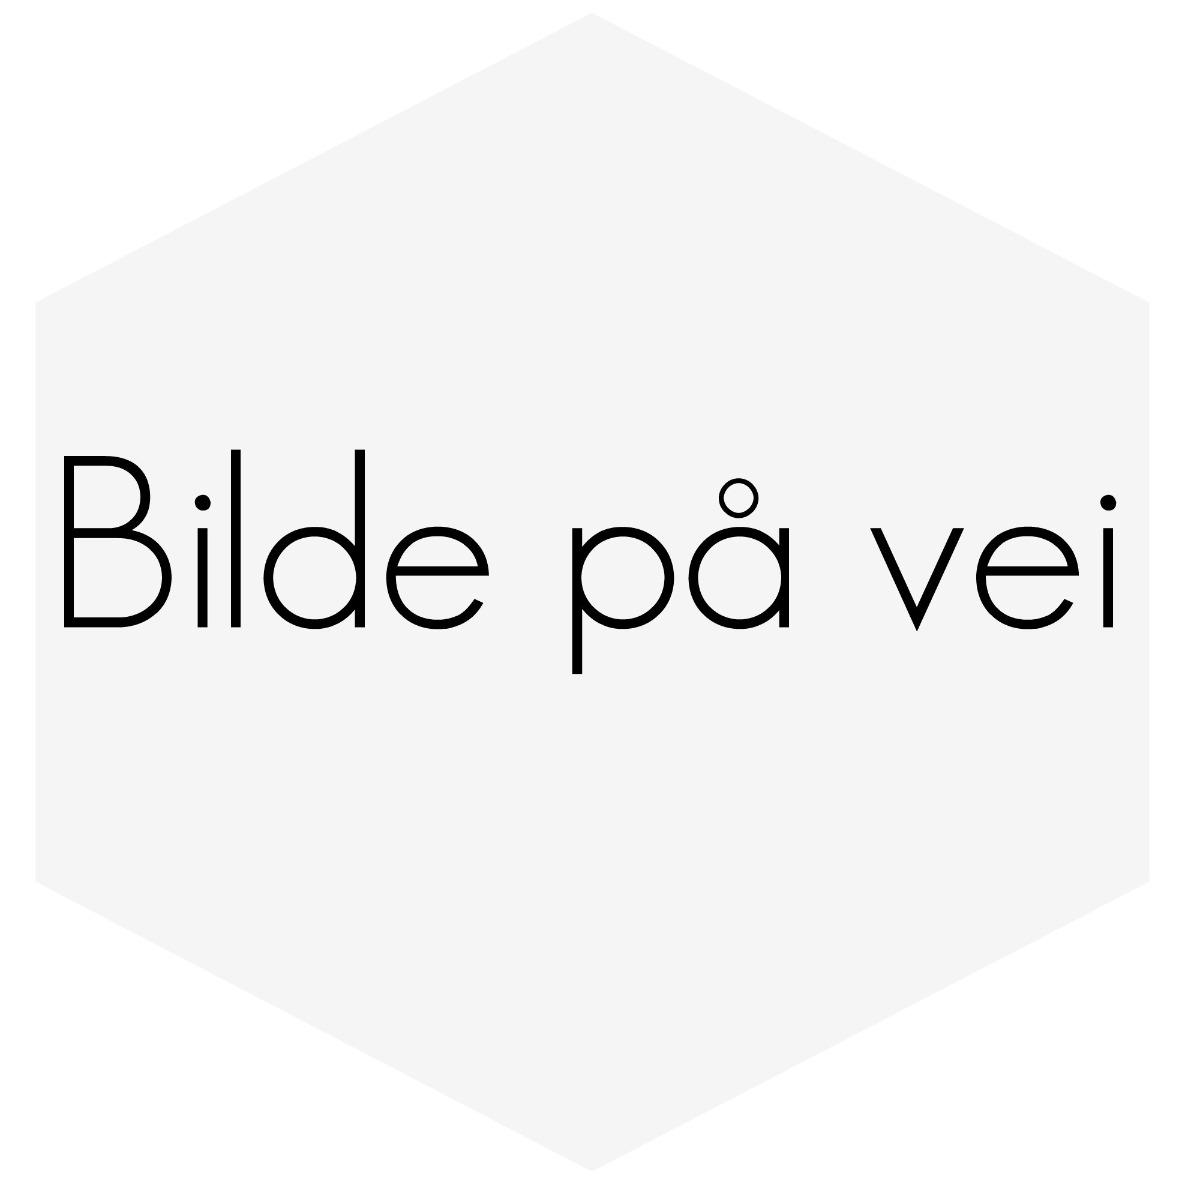 "SILIKONSLANGE RØD REDUSERING 1-1,25"" (25-32MM)"